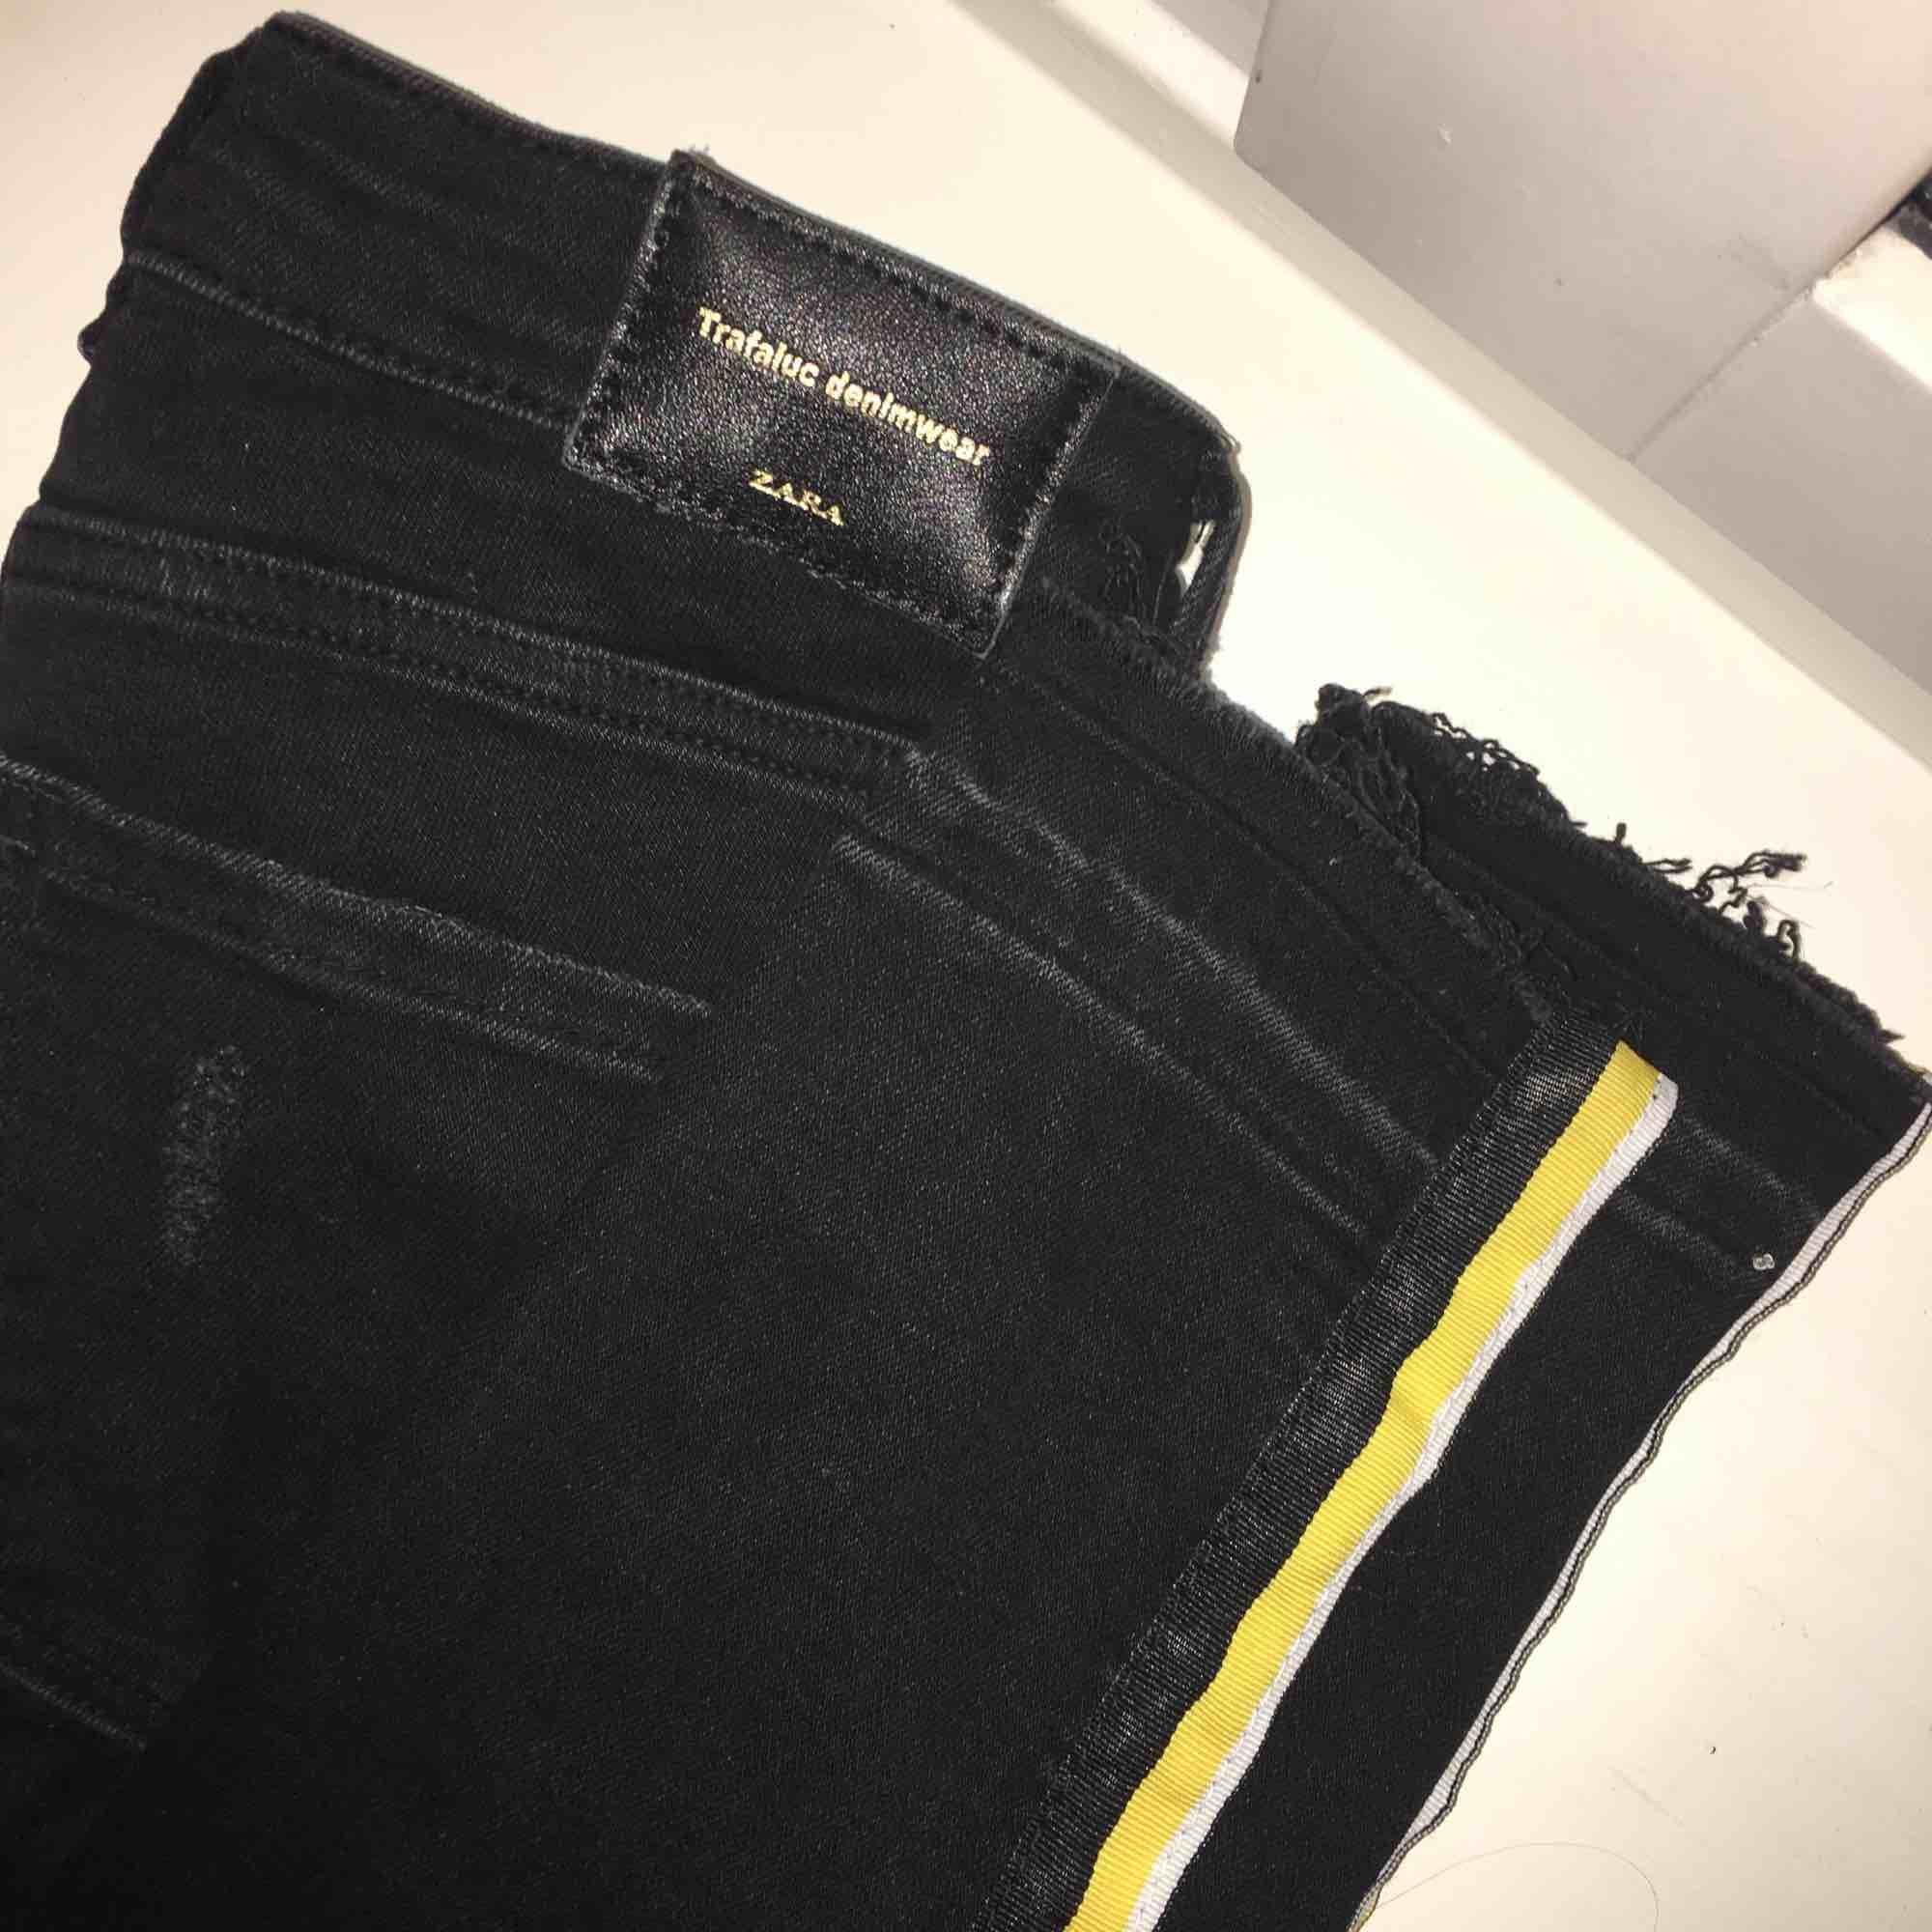 Svarta slim jeans med en gulvit - Zara Jeans   Byxor - Second Hand b09ad1e19016e